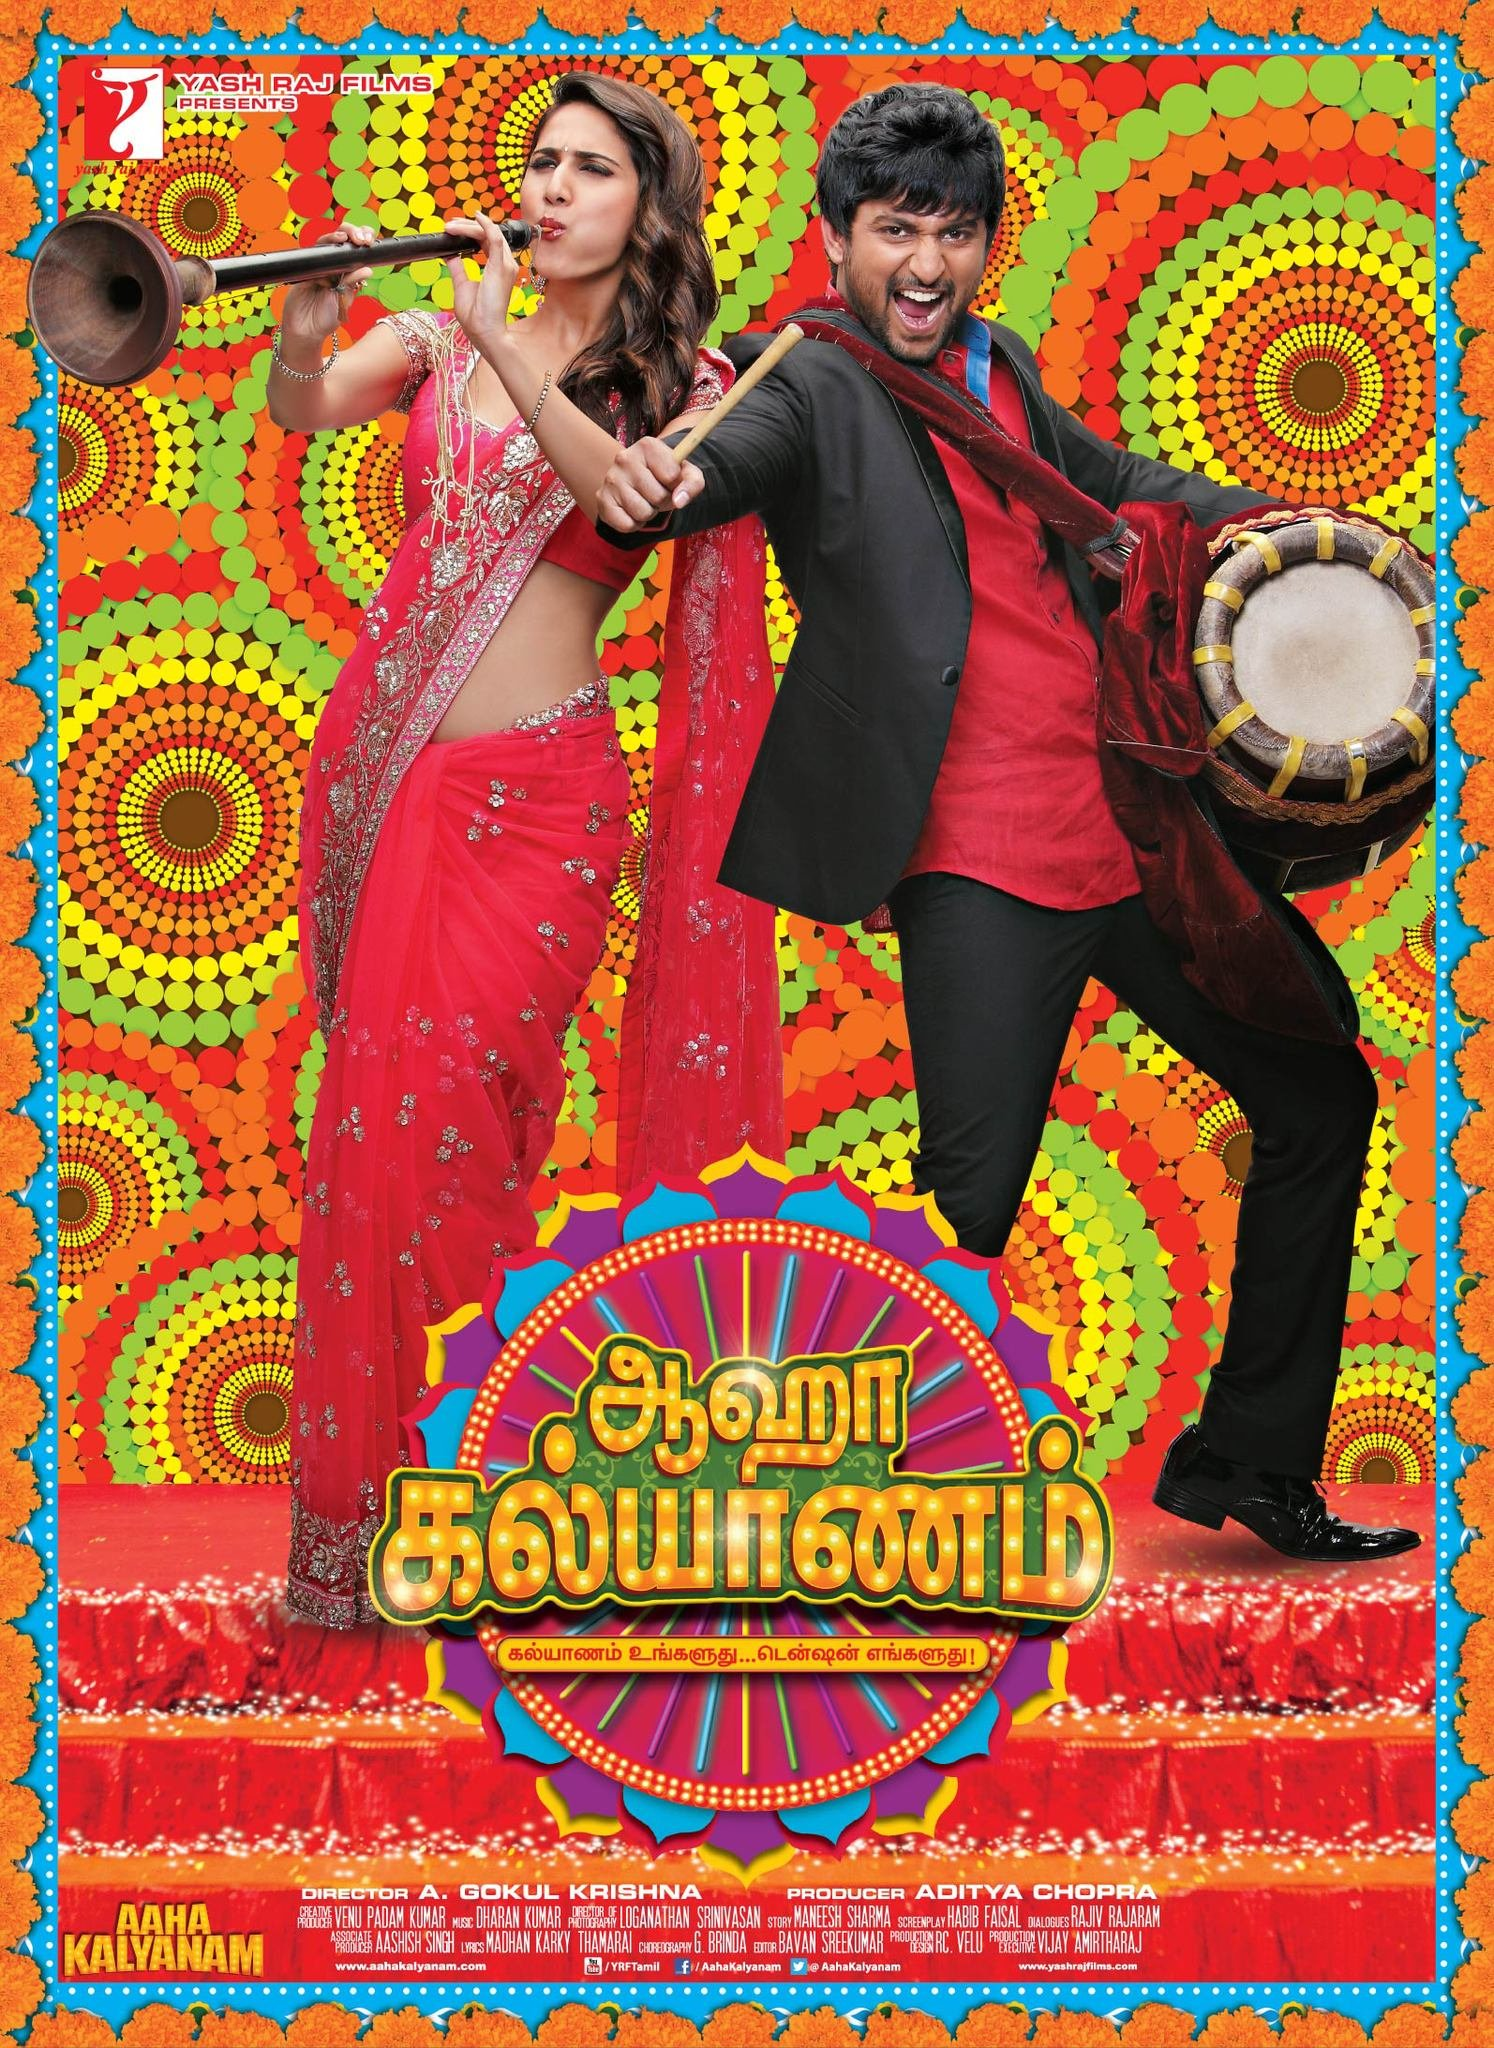 Aaha Kalyanam Movie Poster